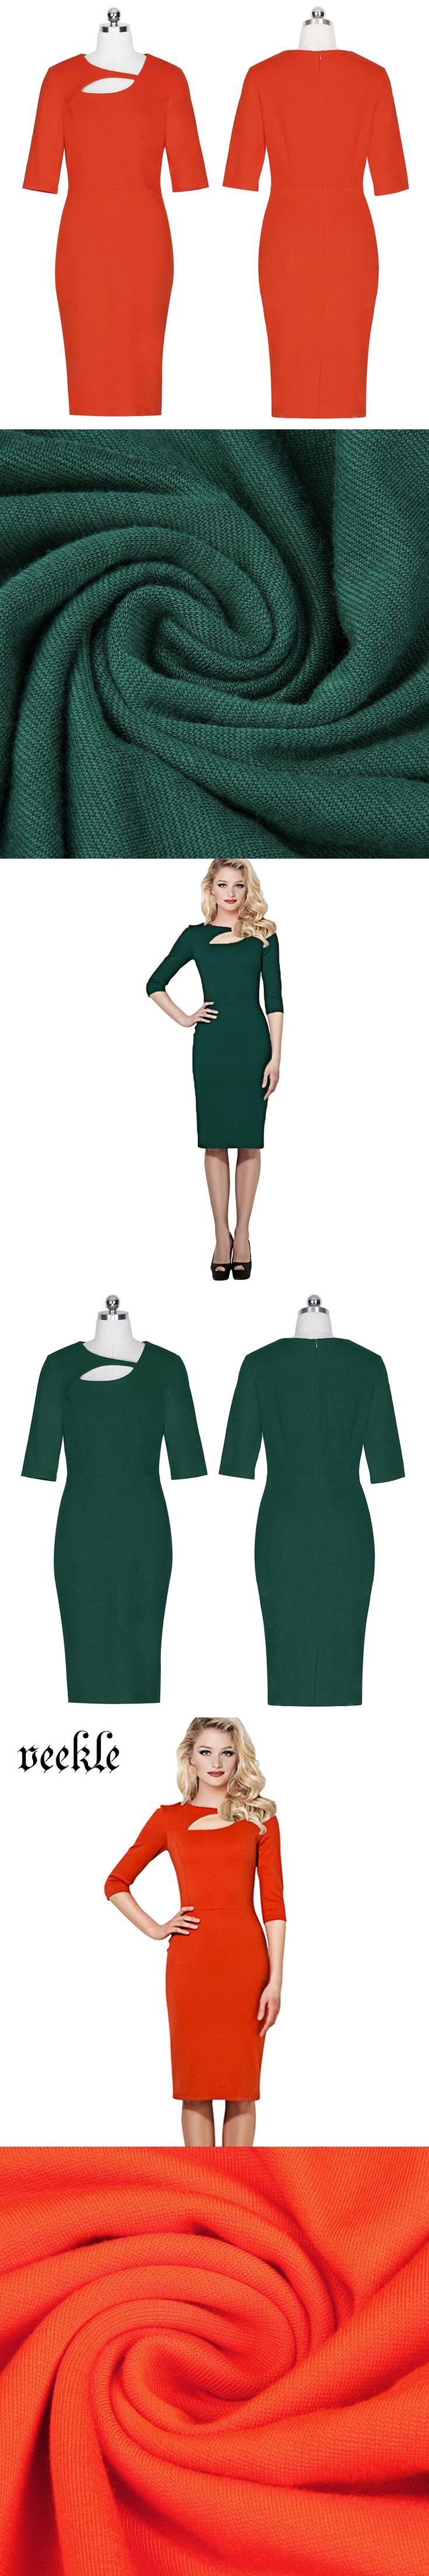 VEEKLE New 2017 Spring Women Solid Office Dress 3/4 Sleeve Elegant Ladies Wear to Work Dresses Robe Femme Kleider Orange Green